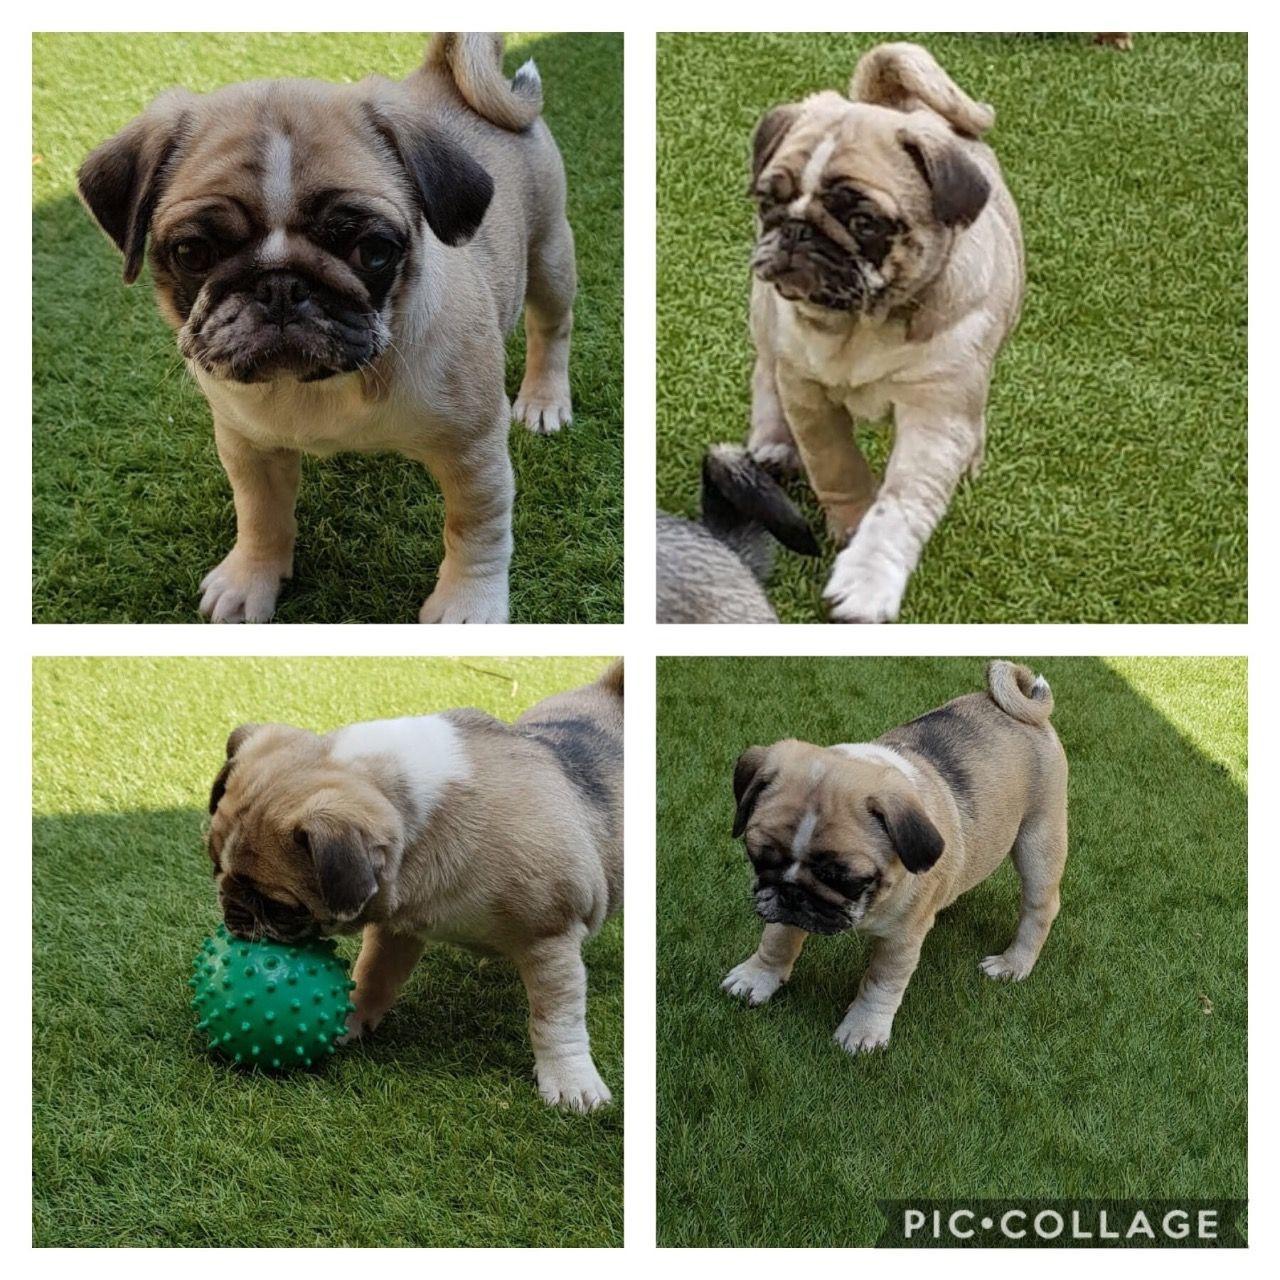 Pug Puppies For Sale Colorado Springs Co 281905